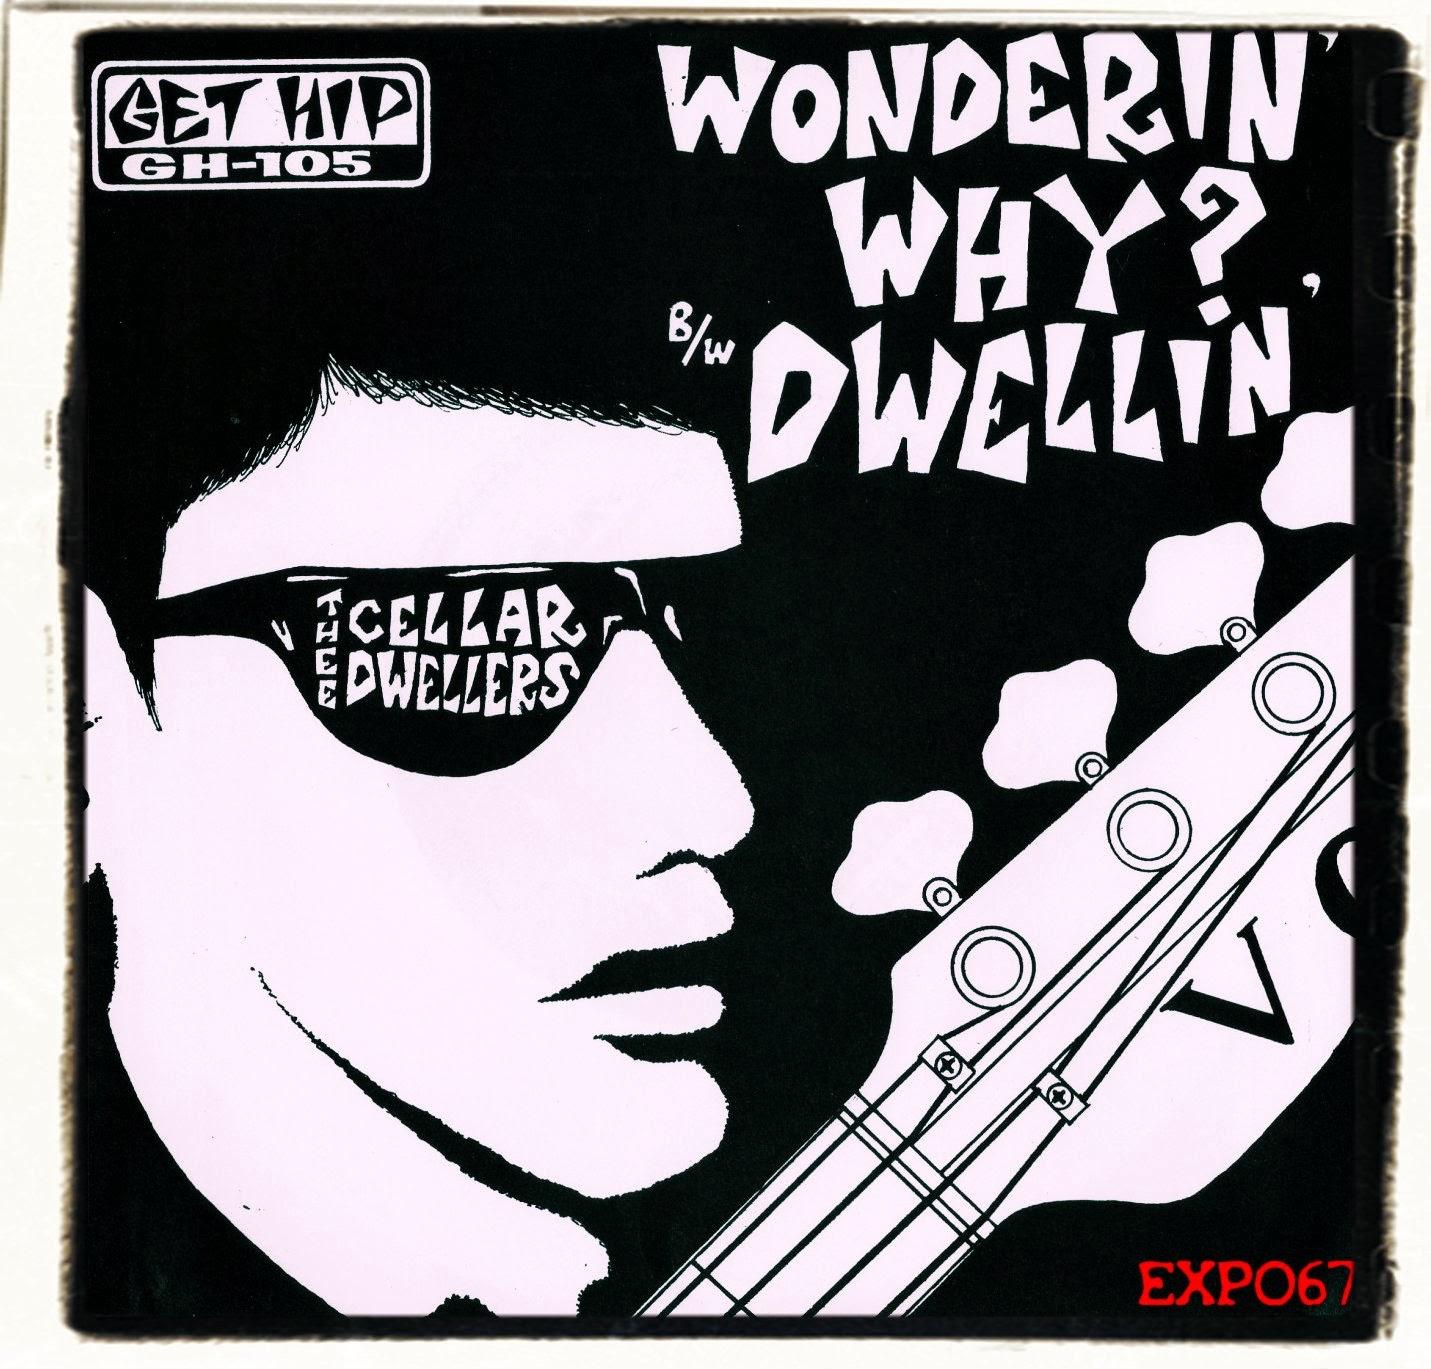 Thee Cellar Dwellers Wonderin' Why - Dwellin'